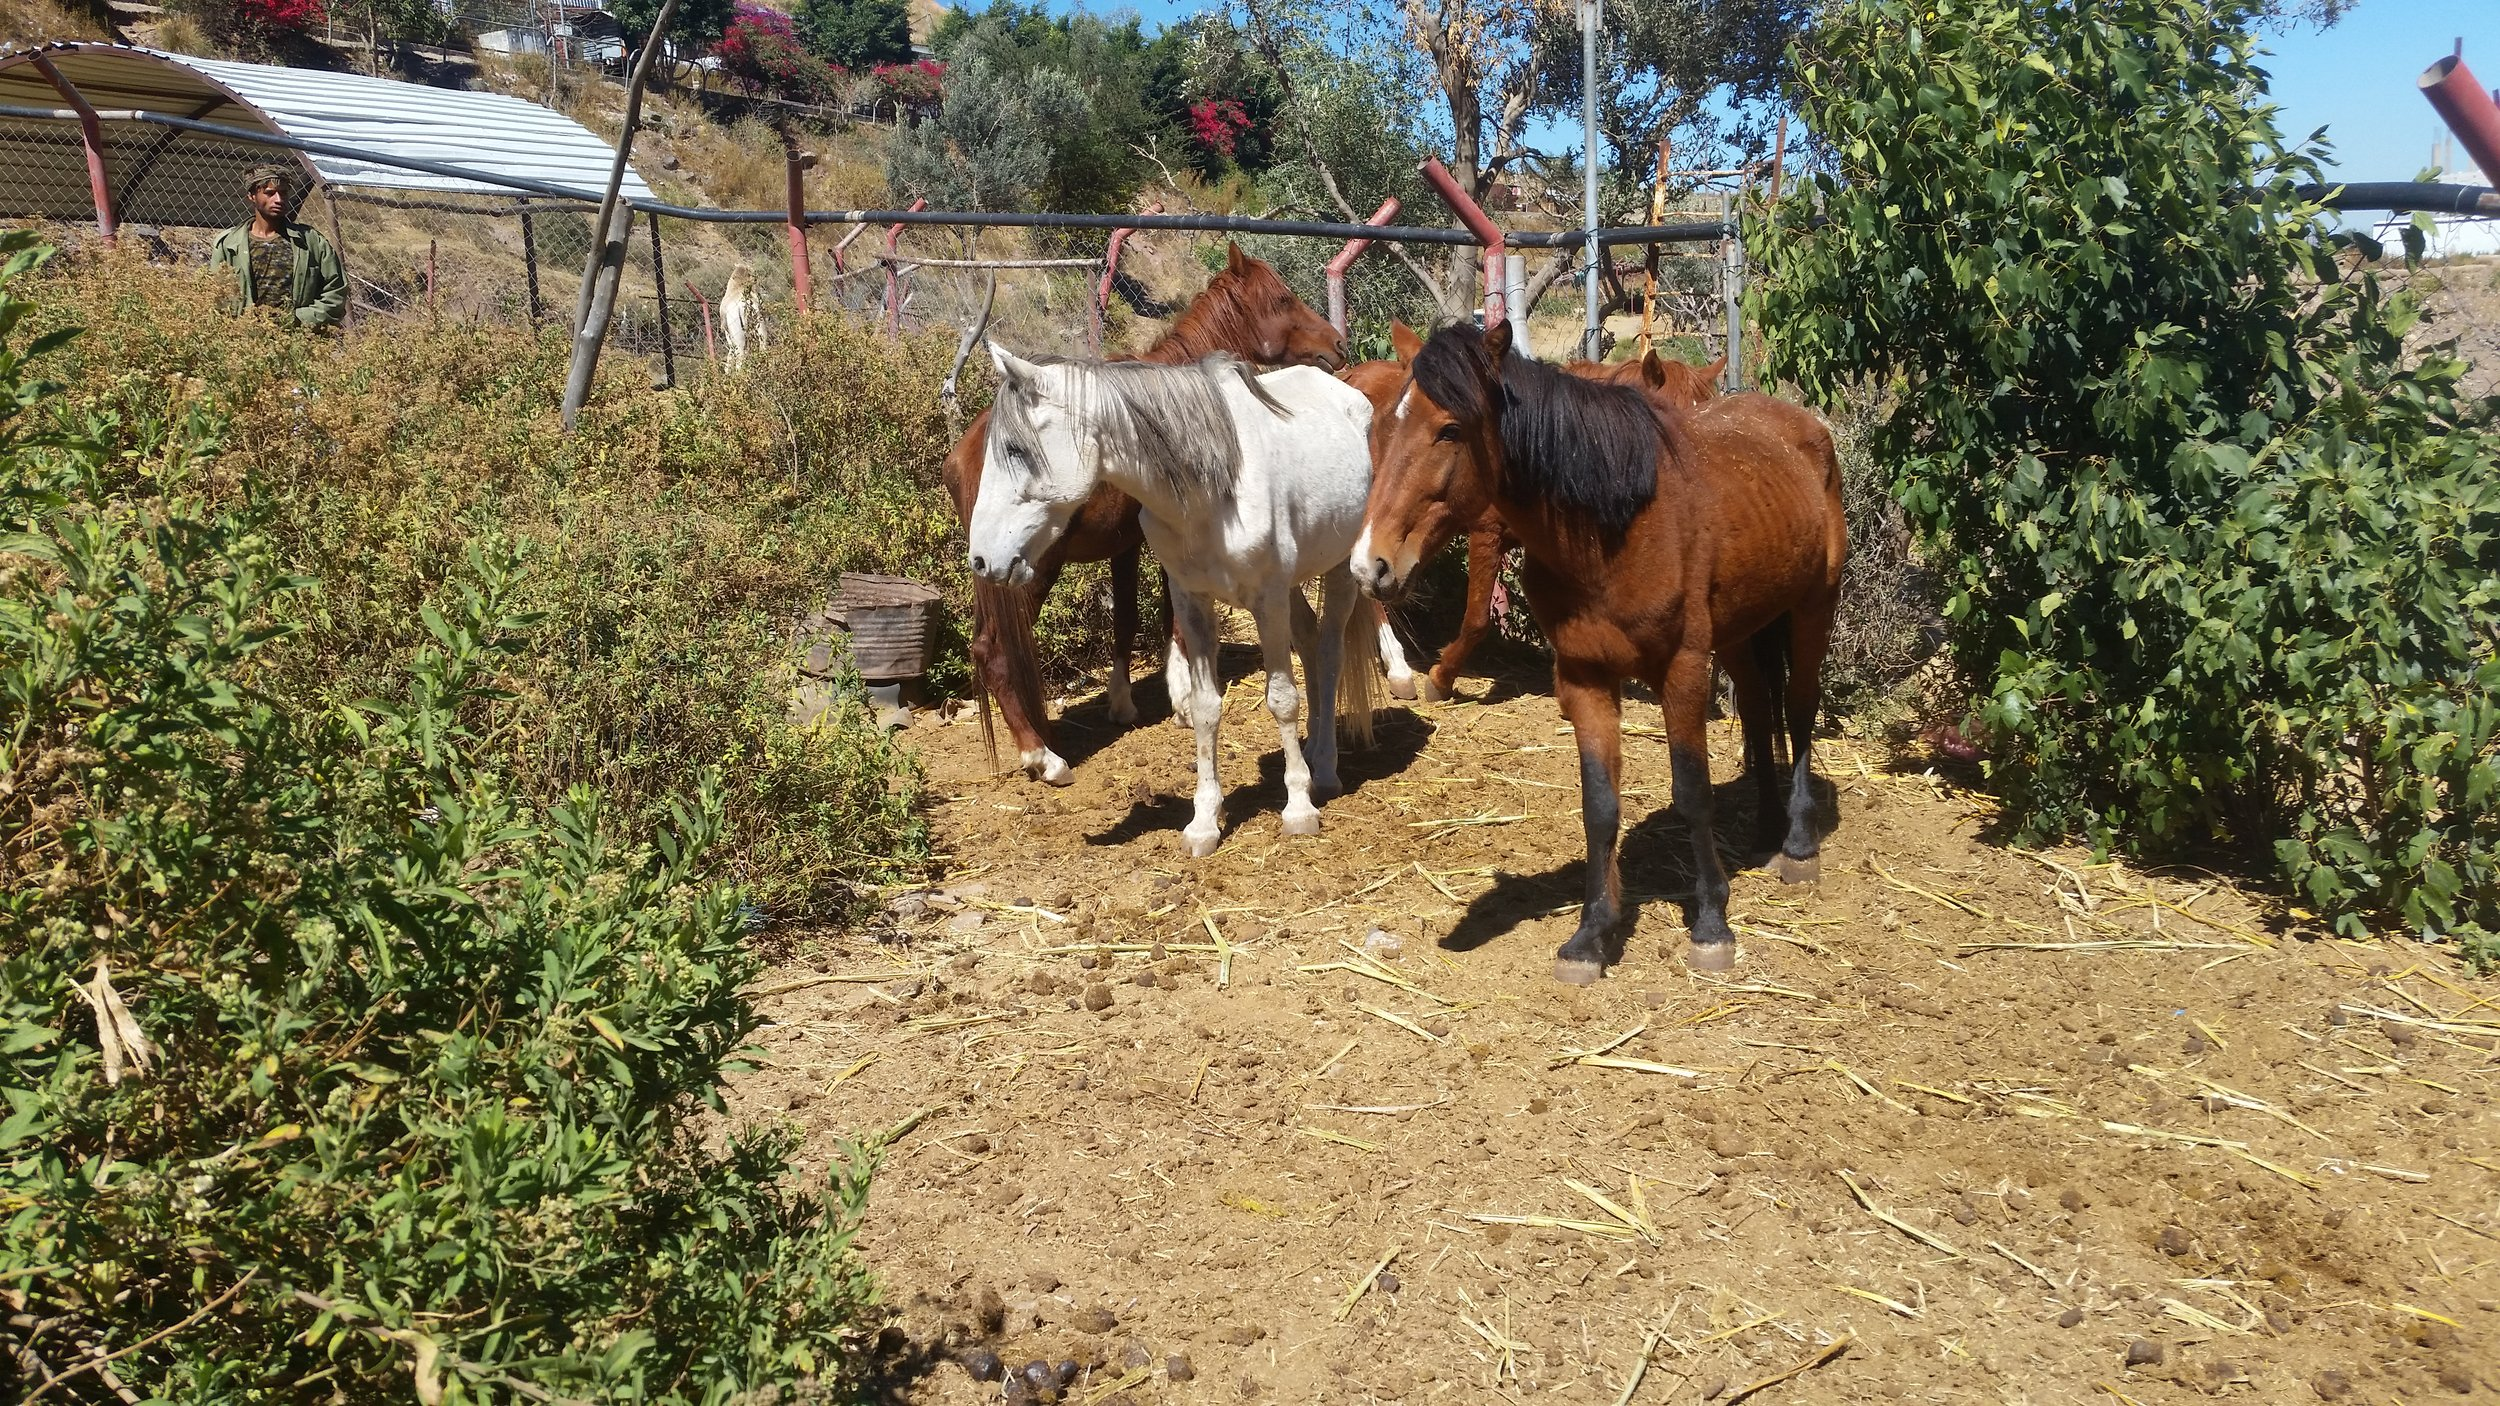 ibb horses 14 NOV 2018 with abdulrazak in background OWAP-AR pic by Hisham.jpg